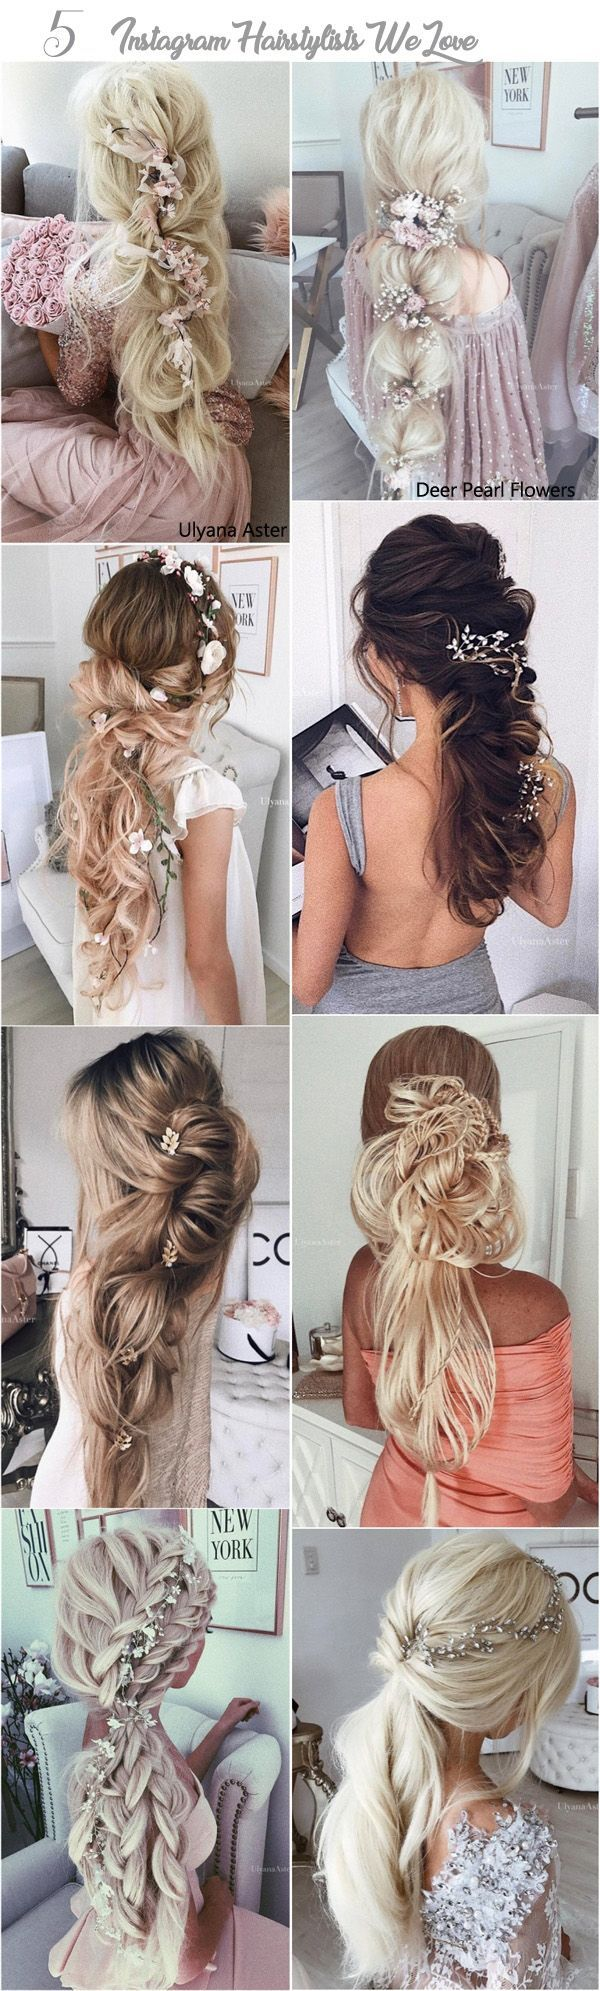 Ullyana Aster Long Wedding Hairstyles / http://www.deerpearlflowers.com/long-wedding-hairstyles-from-instagram-hair-gurus/